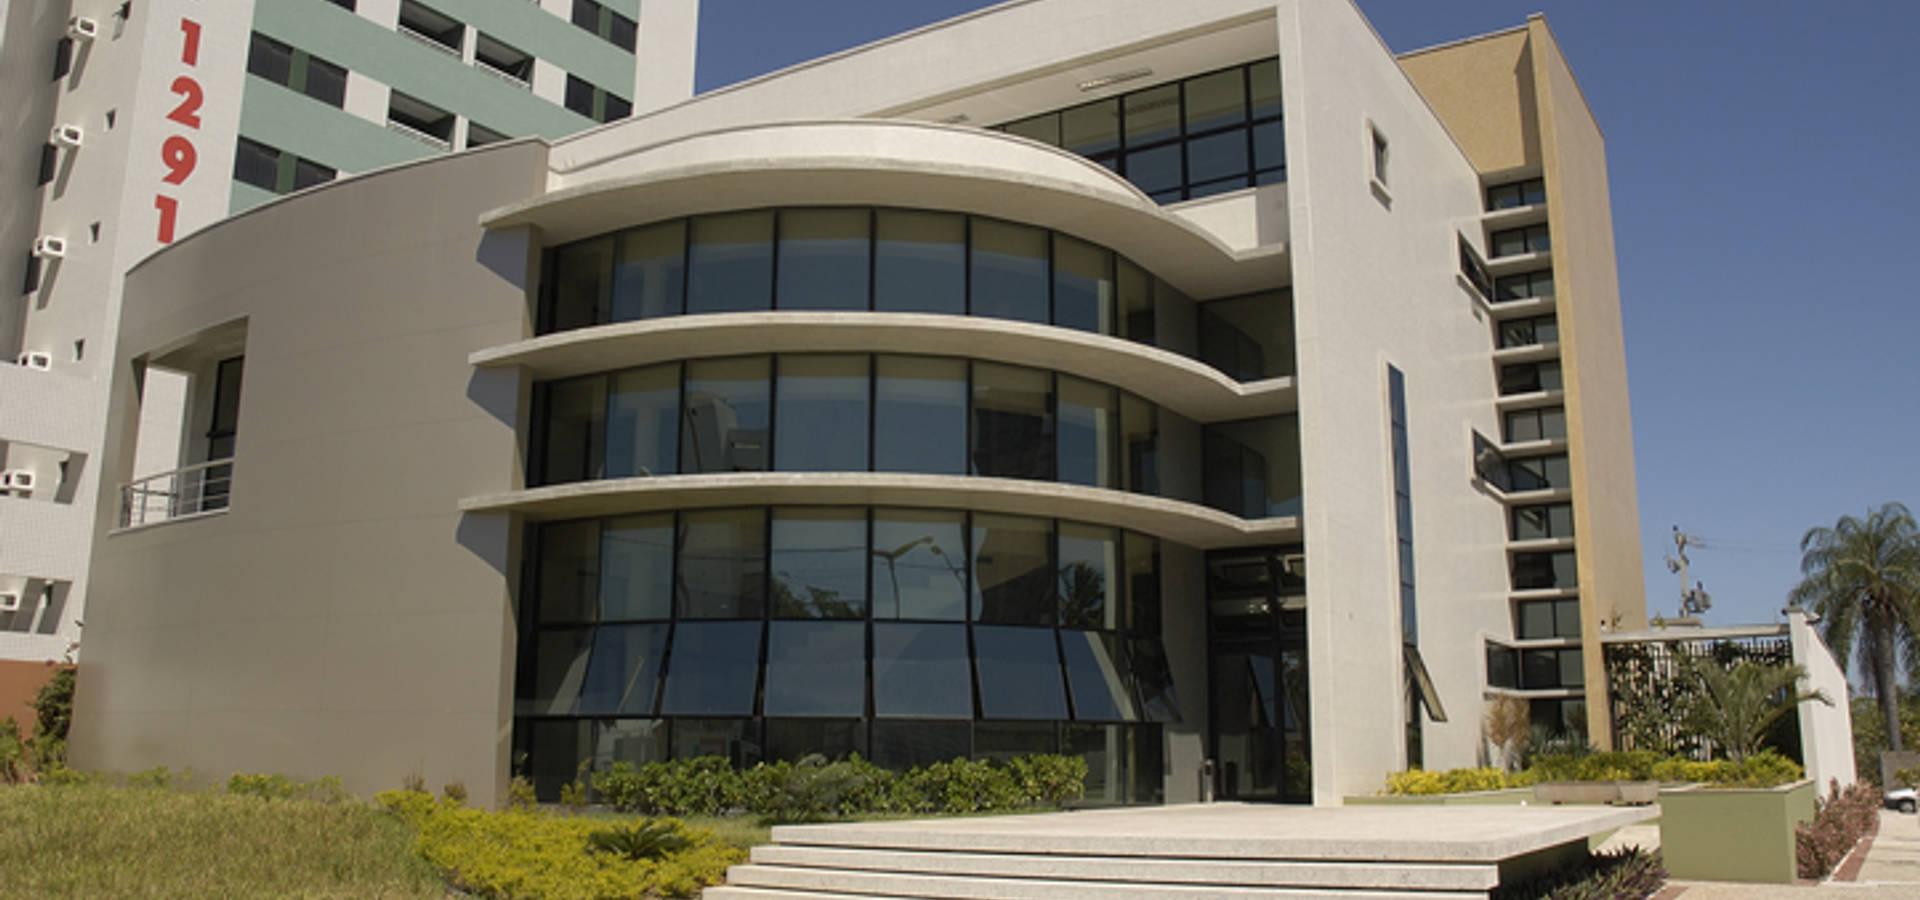 Aurion Arquitetura e Consultoria Ltda